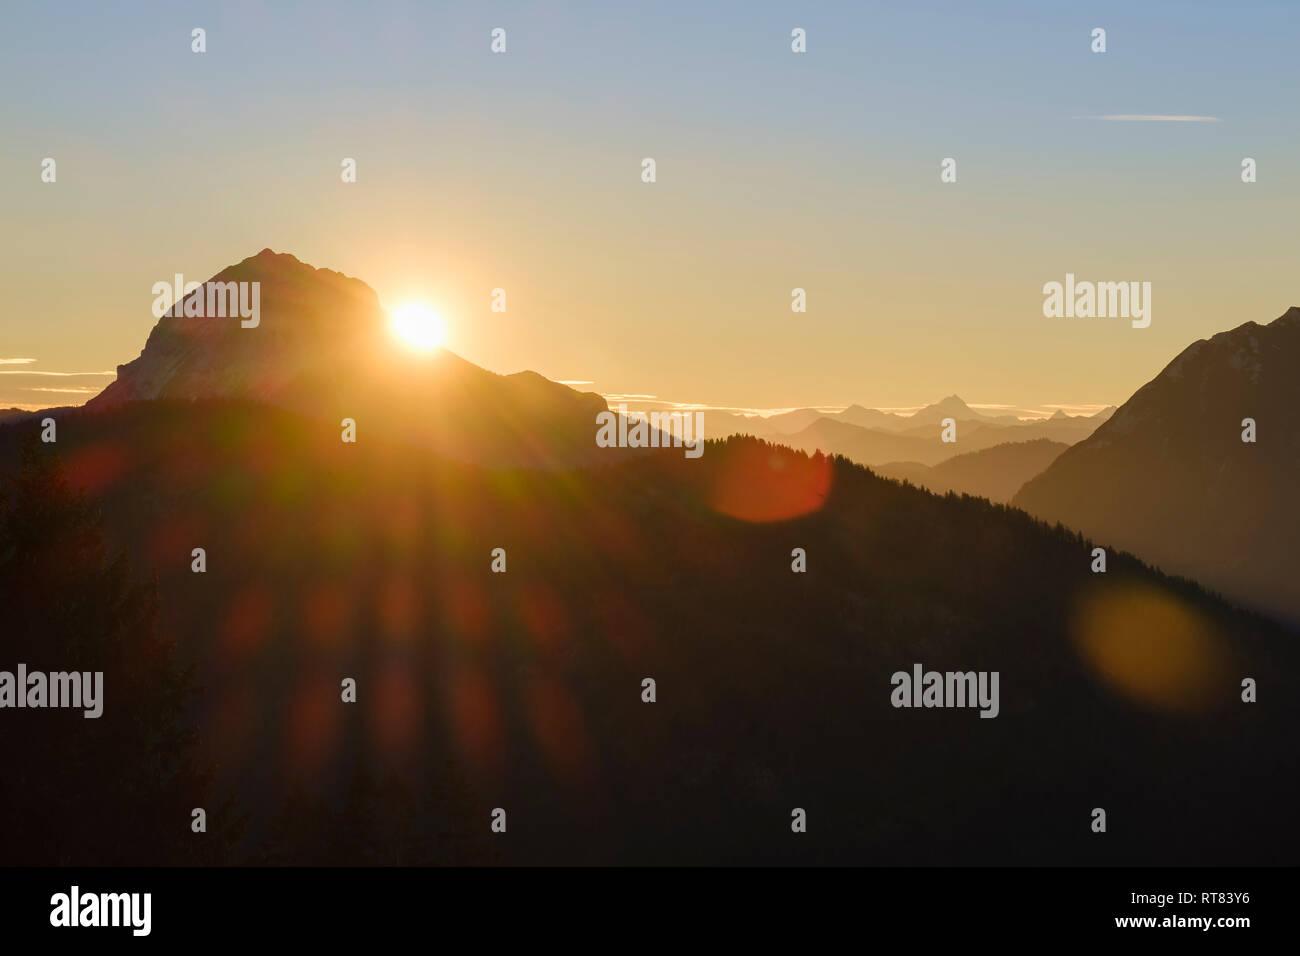 Germany, Bavaria, Lenggries, Isarwinkel, Bavarian Alps, view from high alp towards Guffert at sunrise Stock Photo